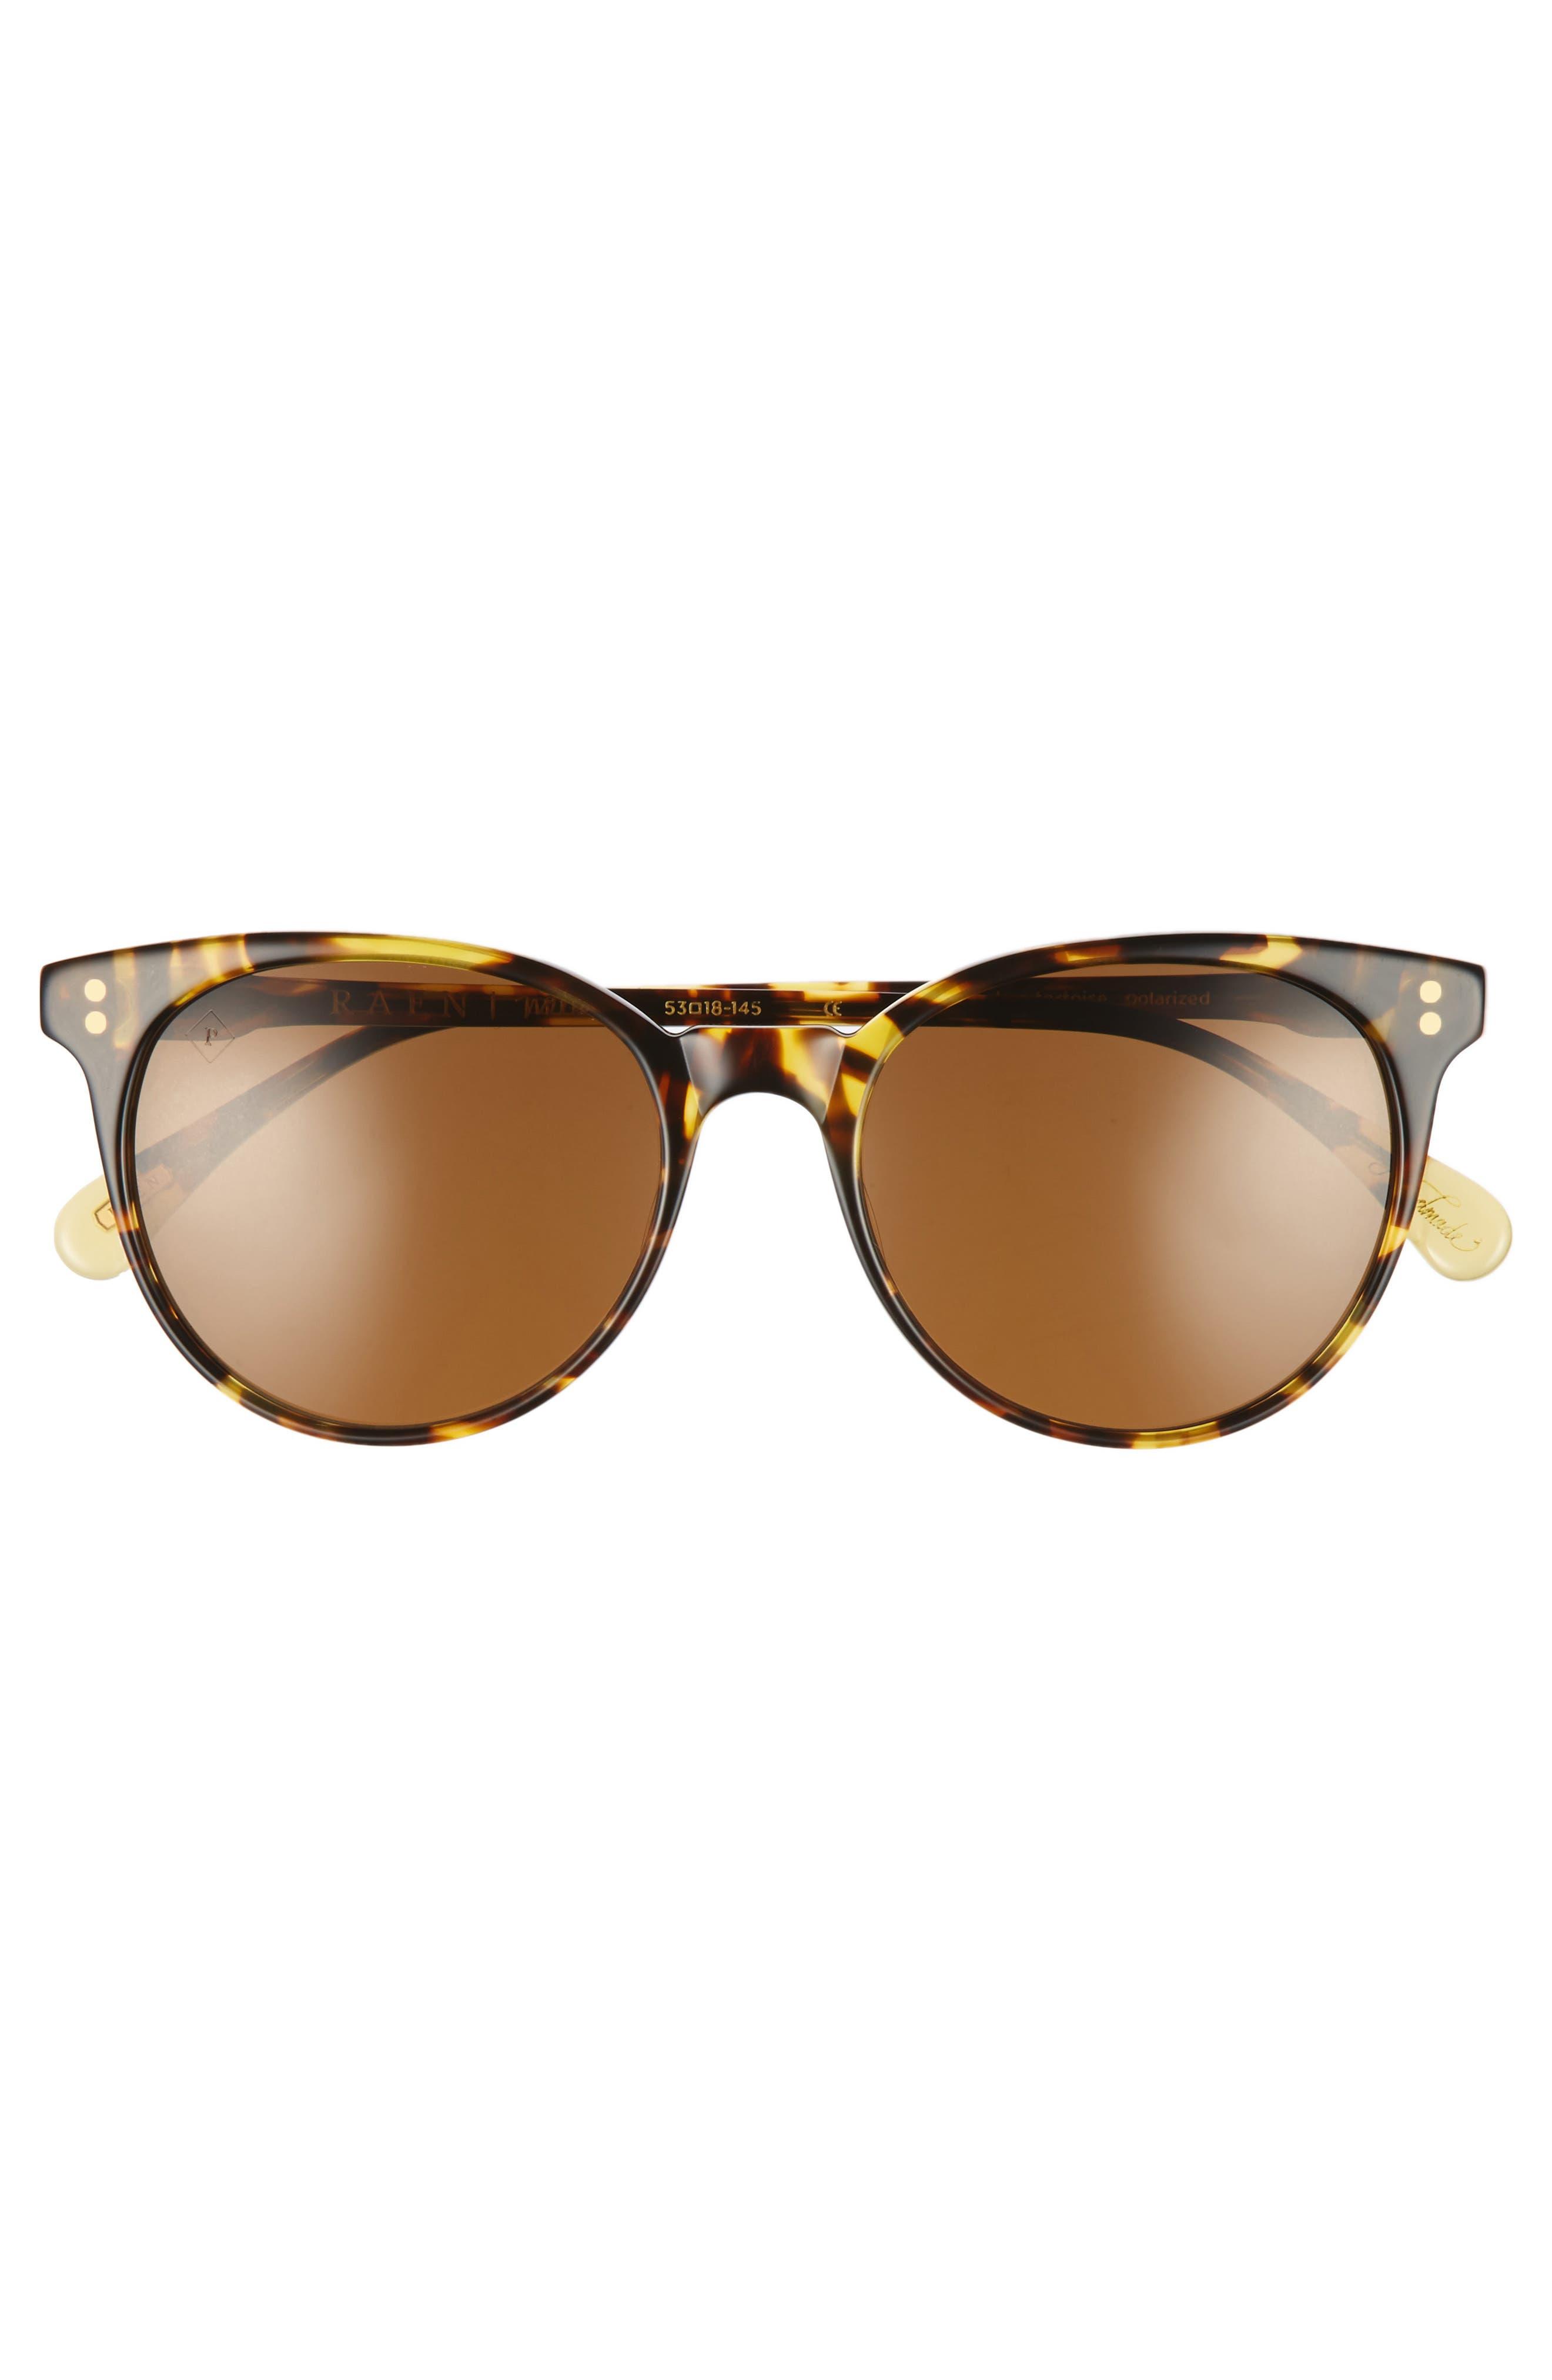 Norie 53mm Sunglasses,                             Alternate thumbnail 2, color,                             Tokyo Tortoise/ Brown